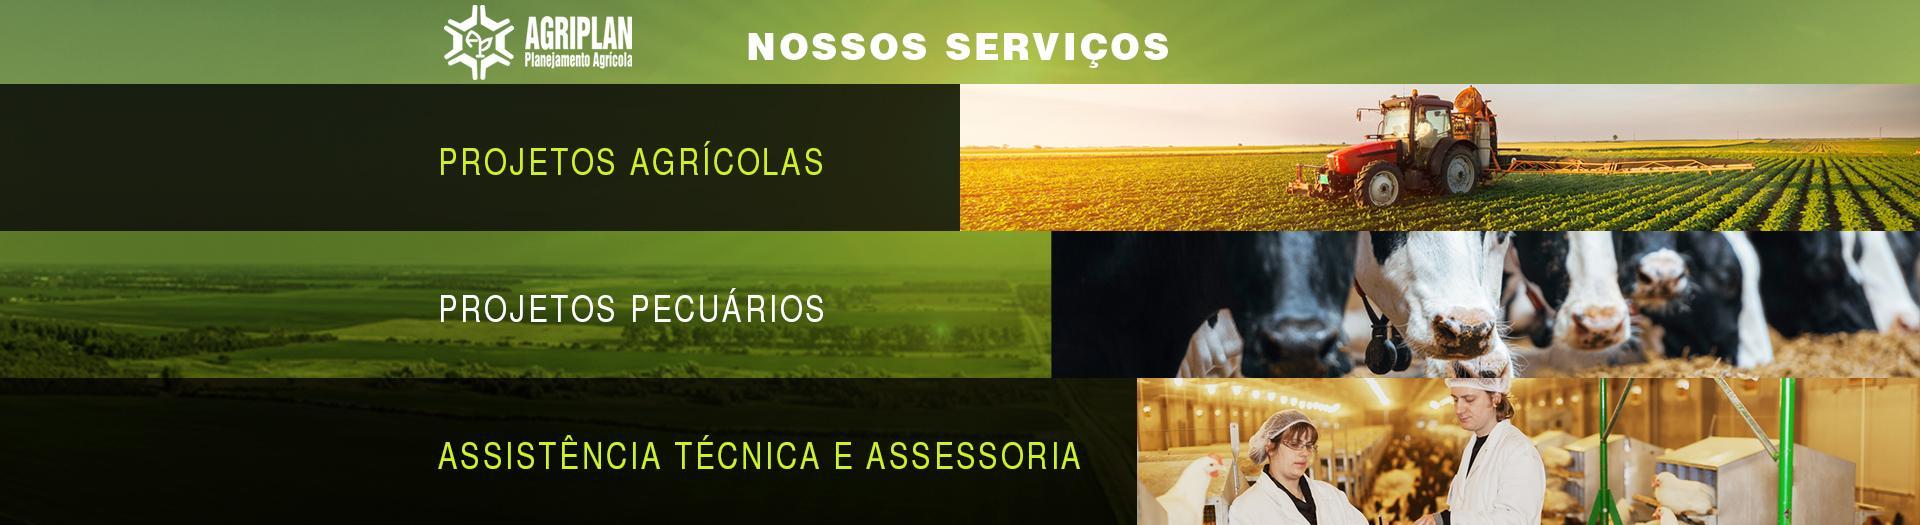 156633548286_banner_servico.jpg